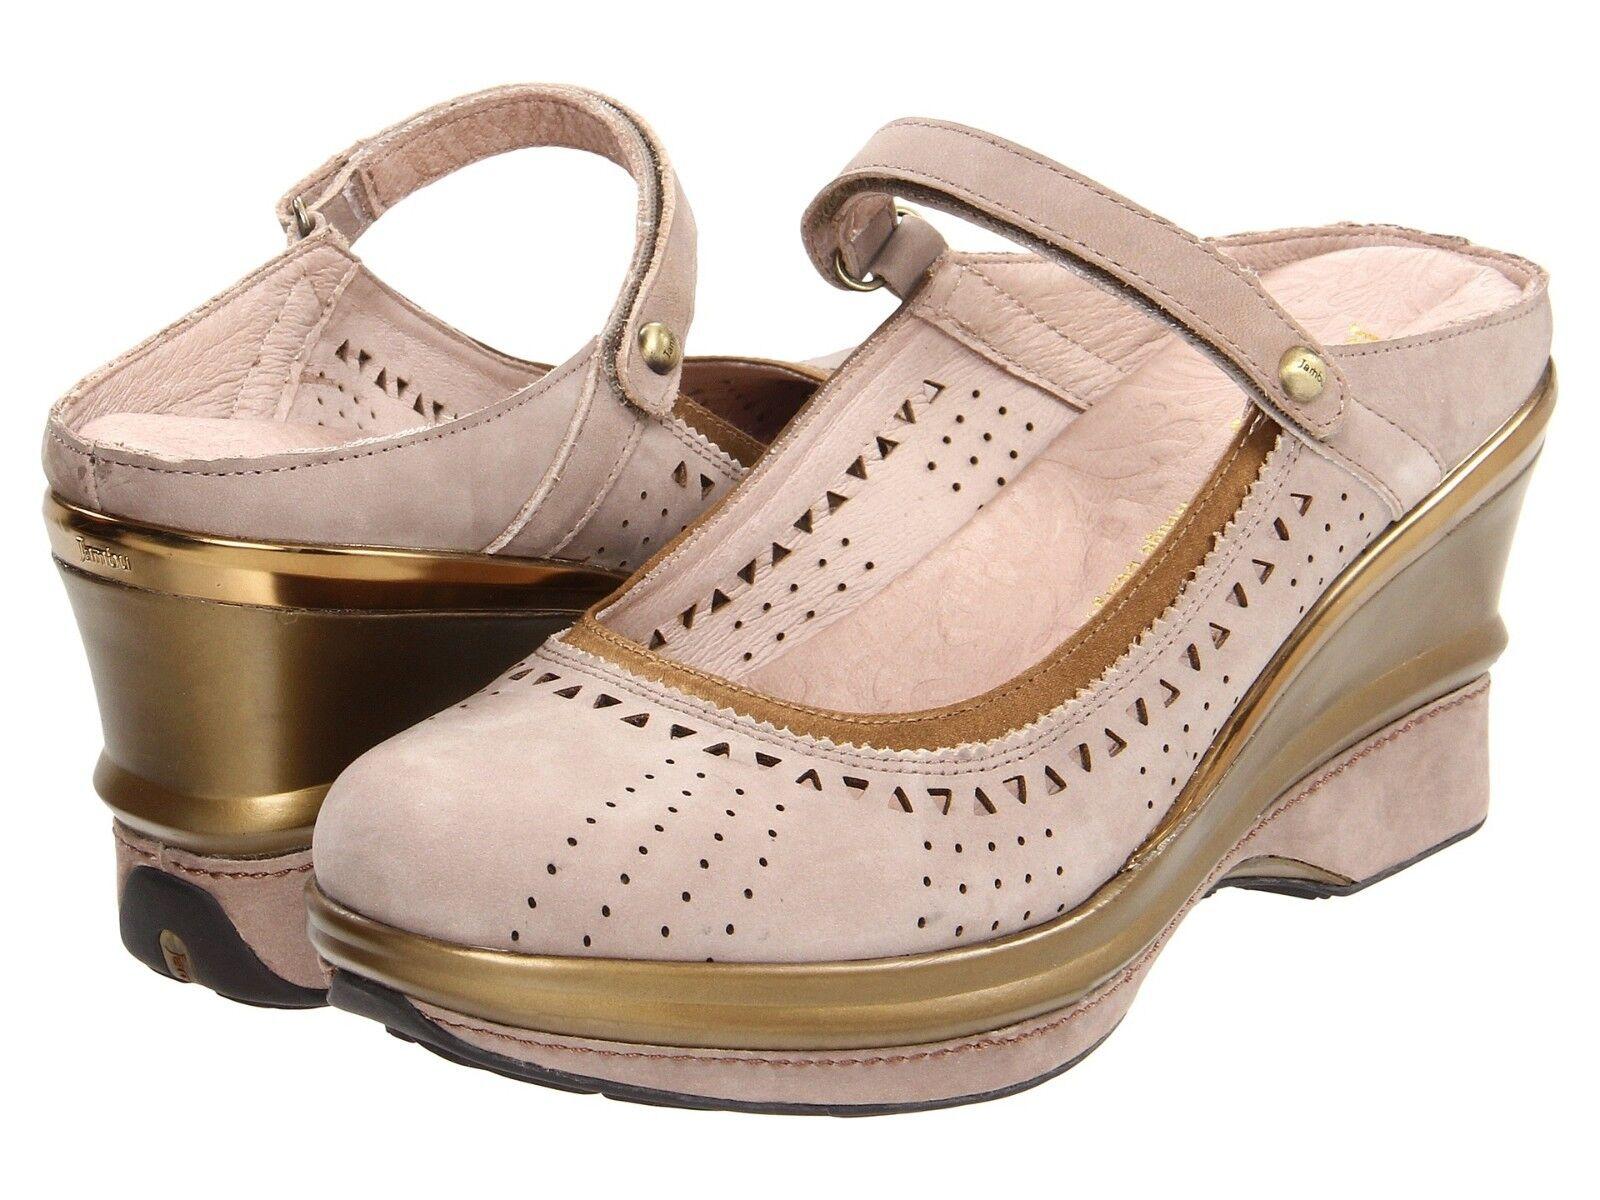 Size 8.5 JAMBU (Leather) Womens shoes  Reg 150 Limited offer Sale  49.99